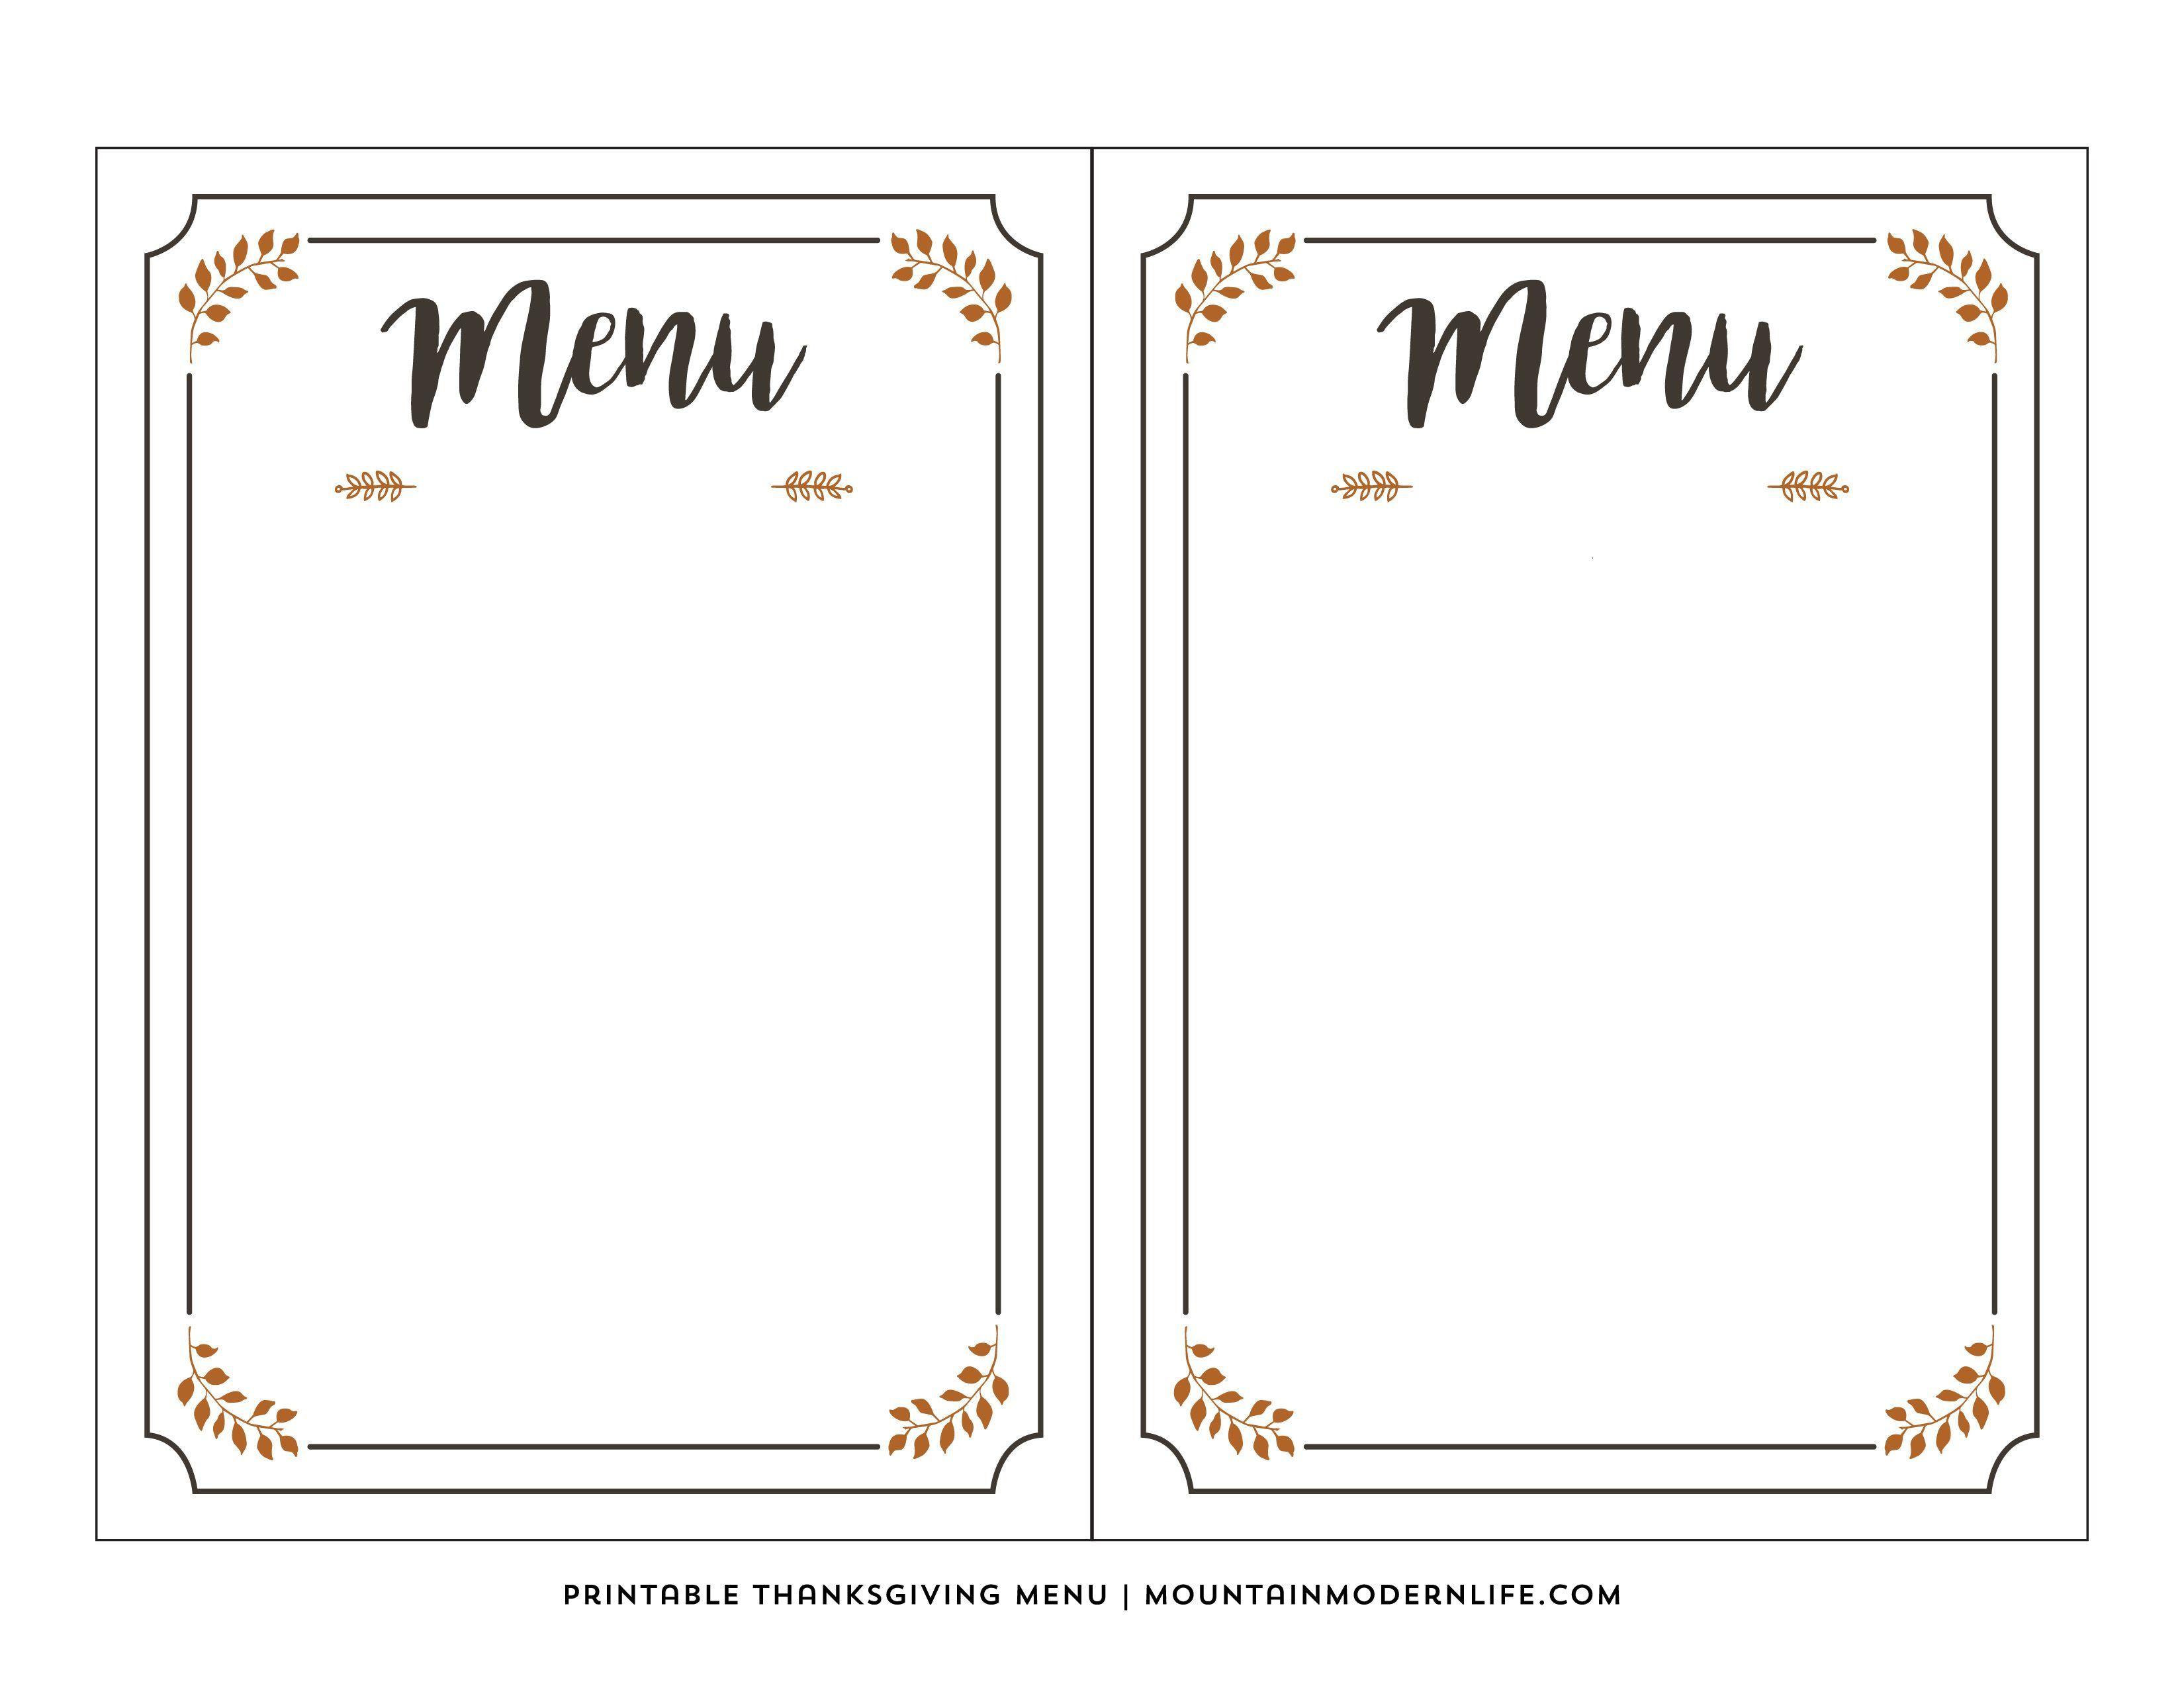 003 Phenomenal Free Printable Menu Template Photo  For Dinner Party FamilyFull